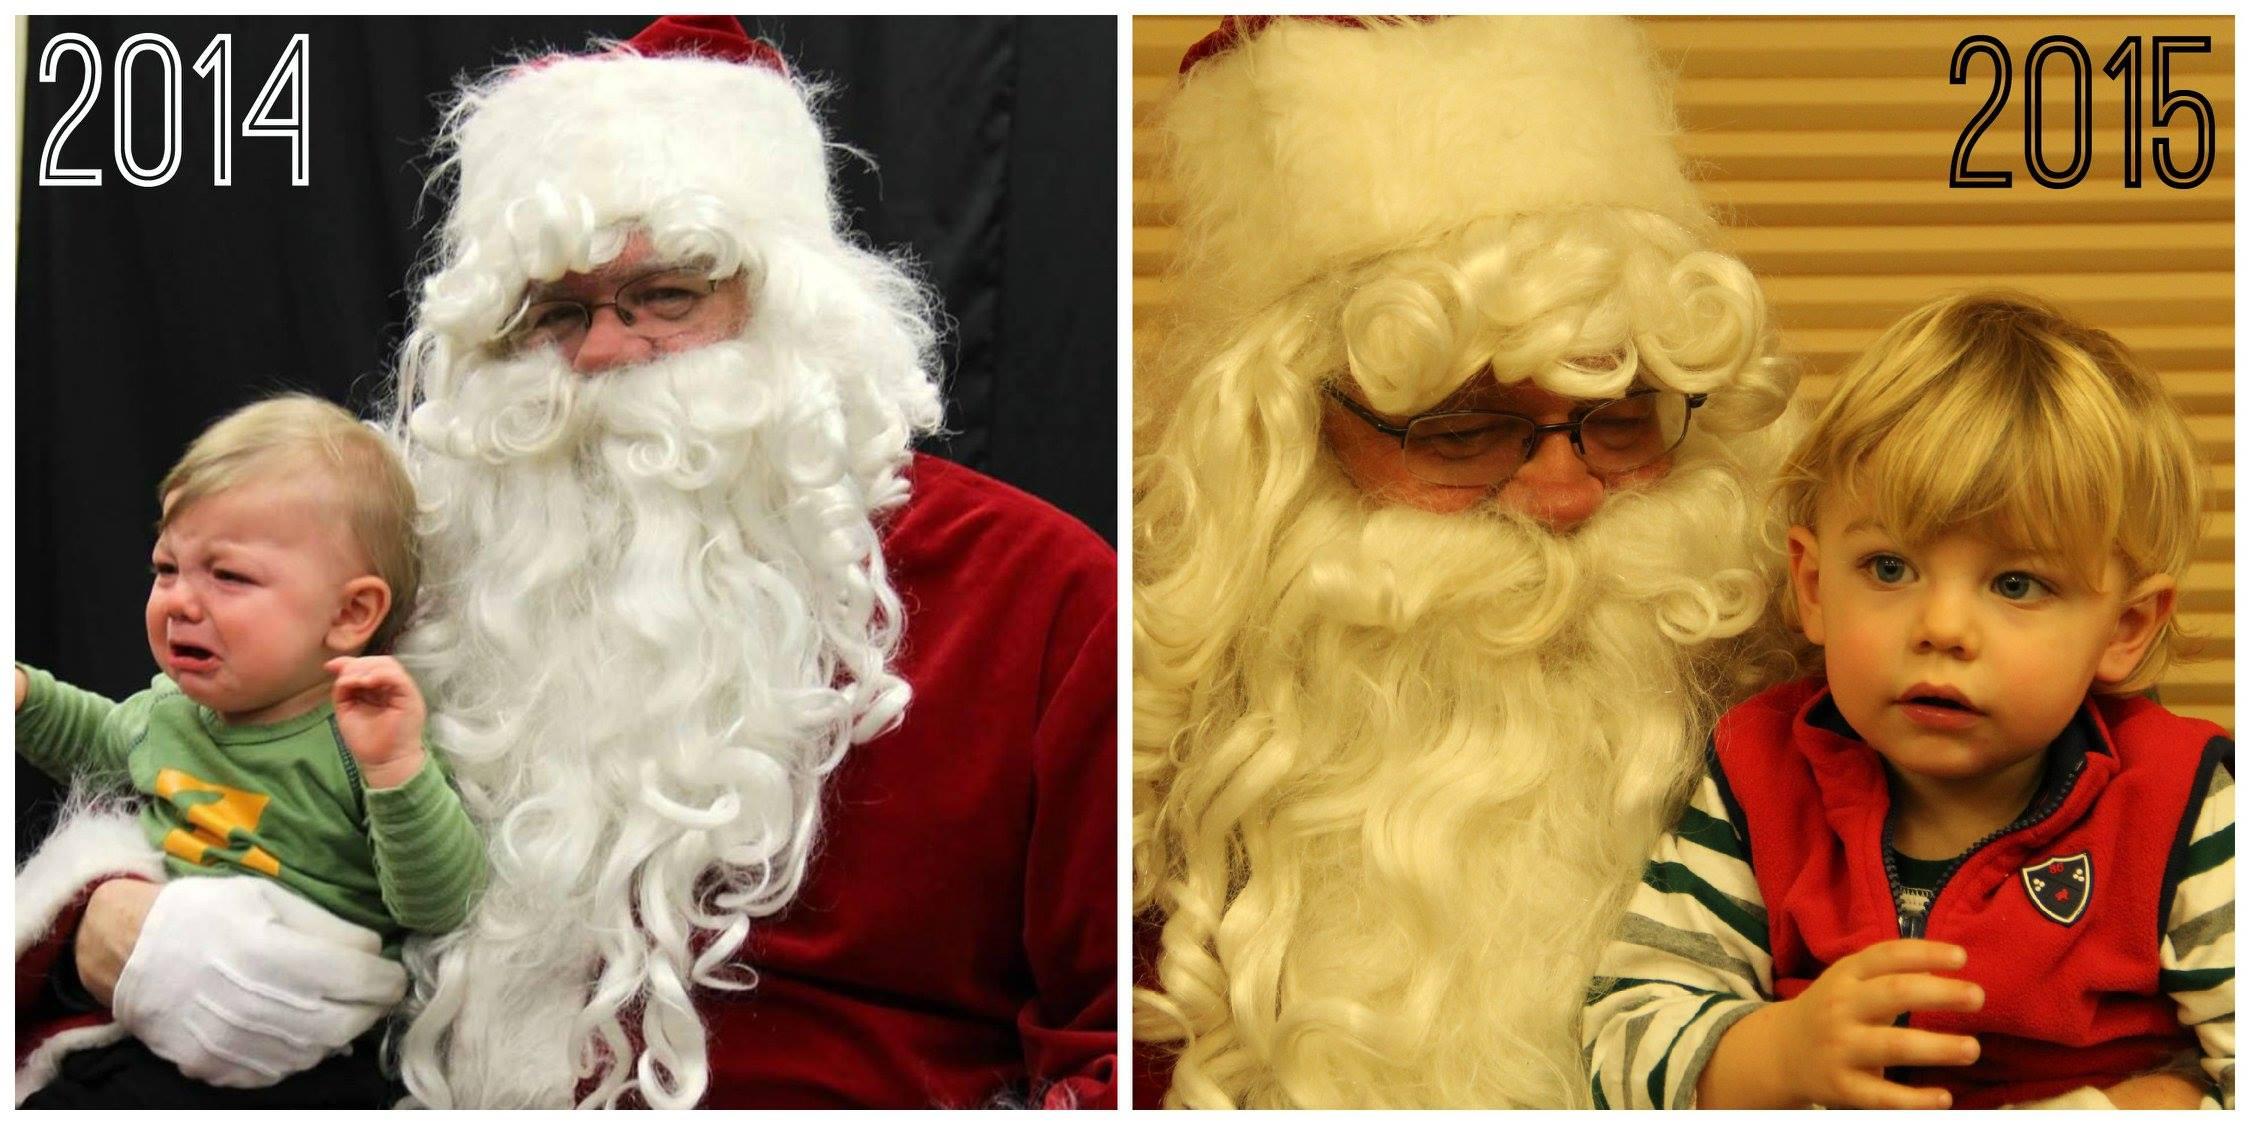 December 15 ·   Same Santa, better attitude.